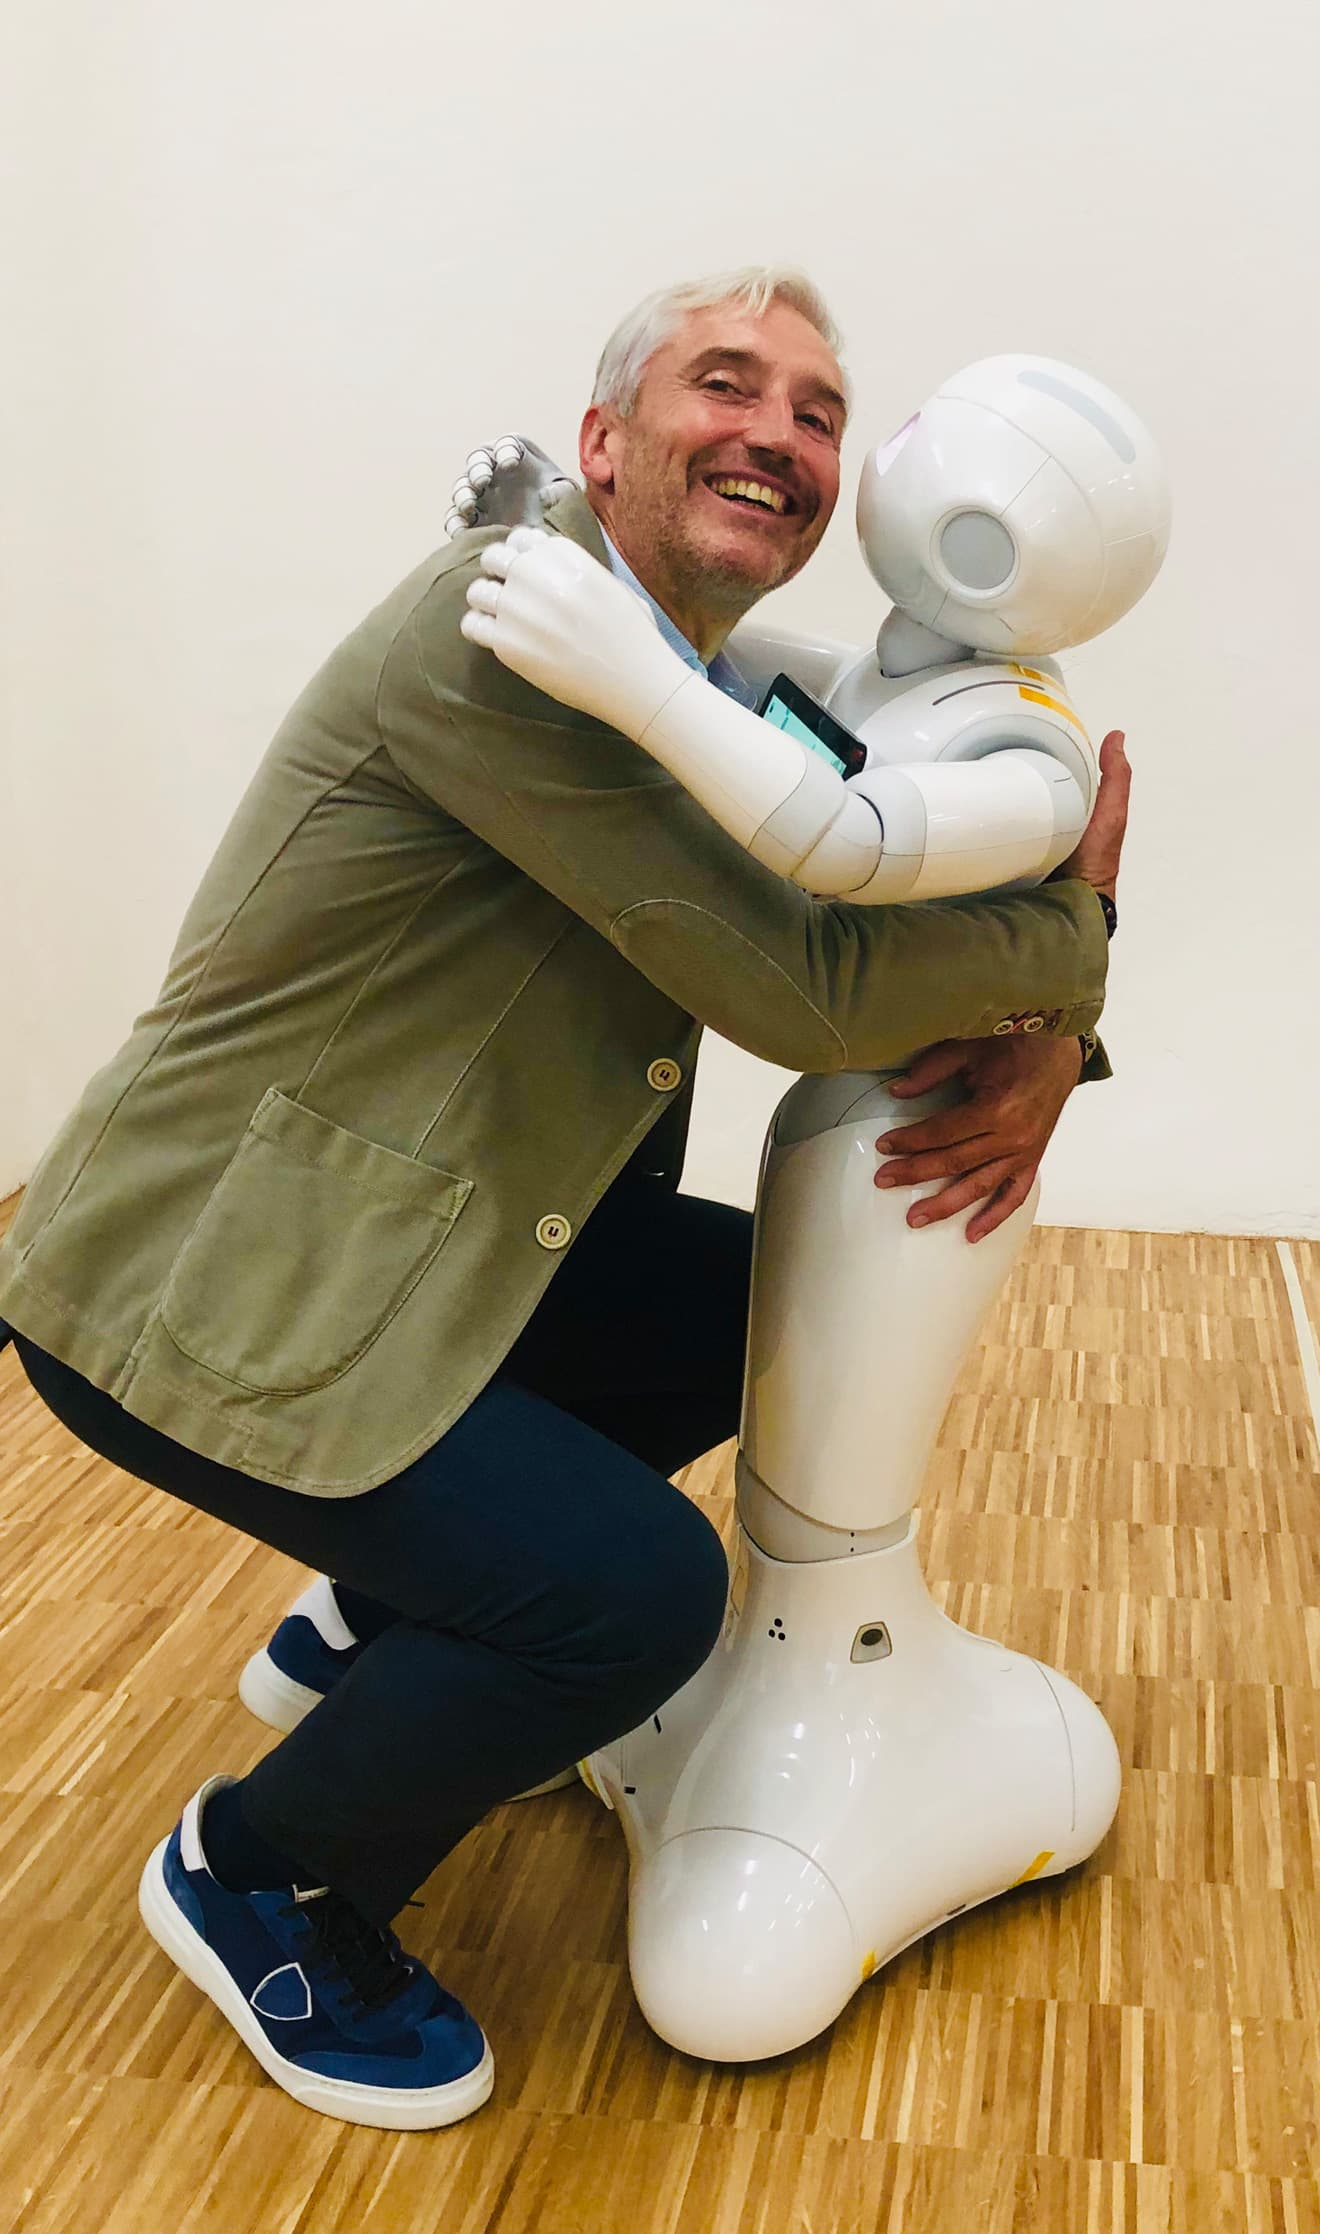 Verabschiedung von Roboter Pepper